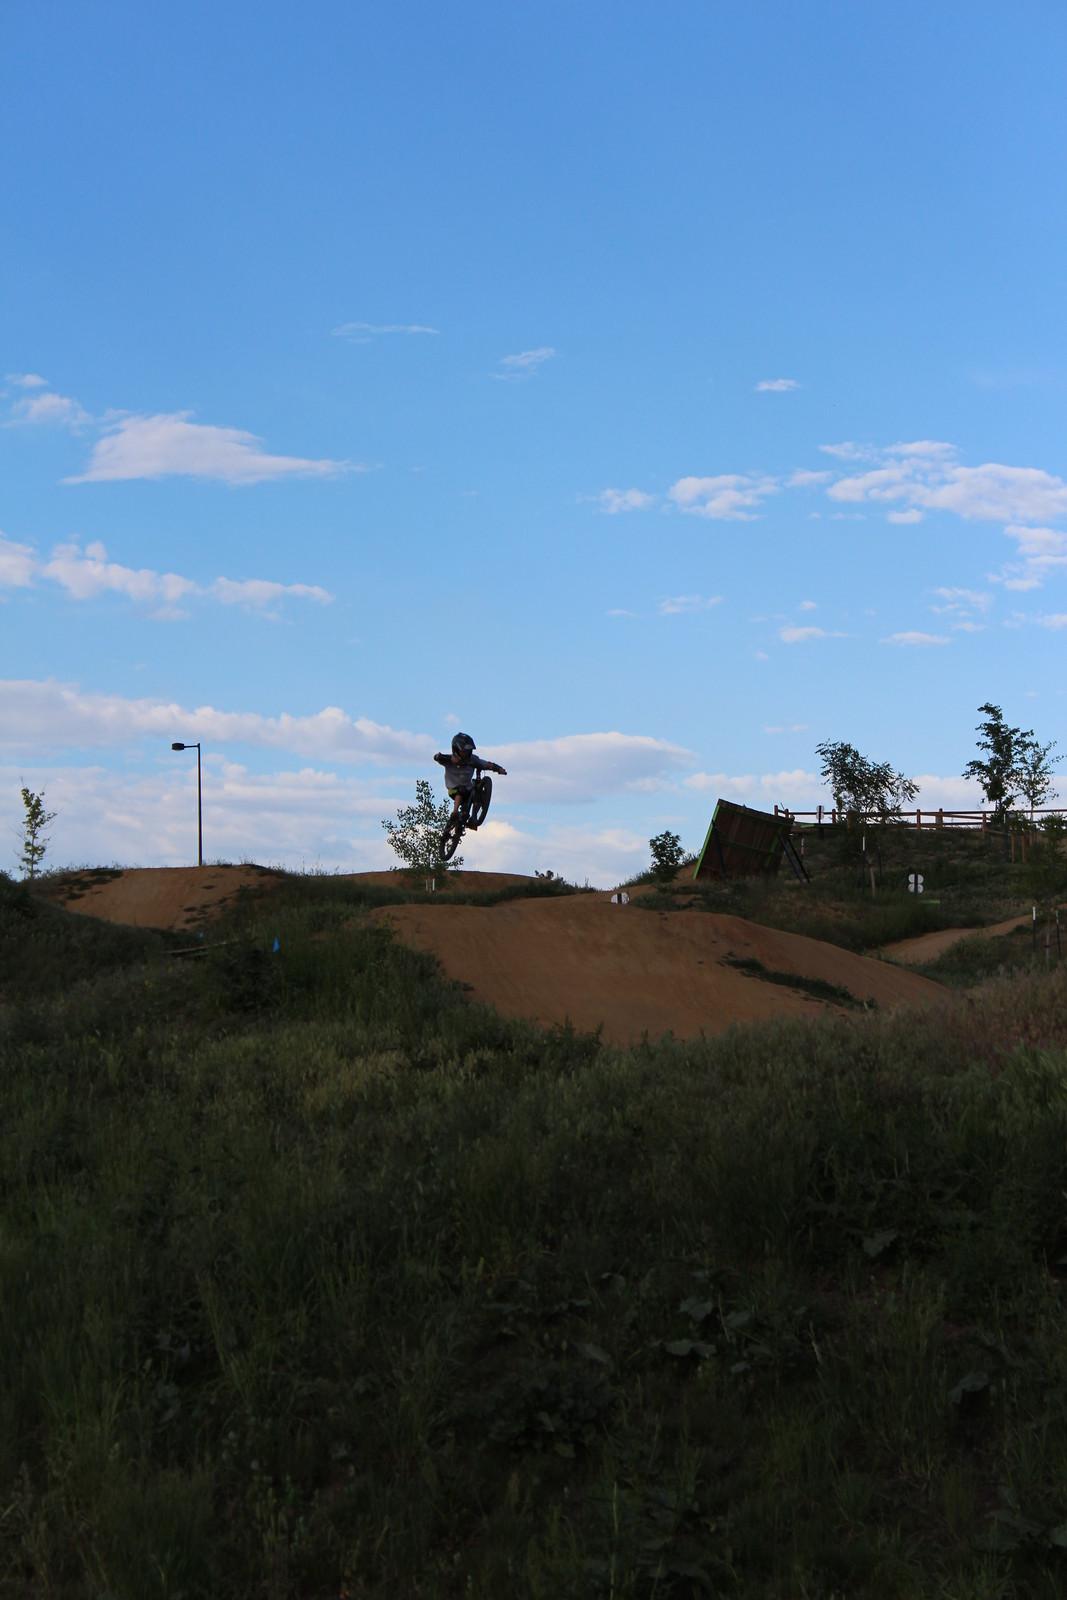 IMG 1113 - michaelleedavis - Mountain Biking Pictures - Vital MTB